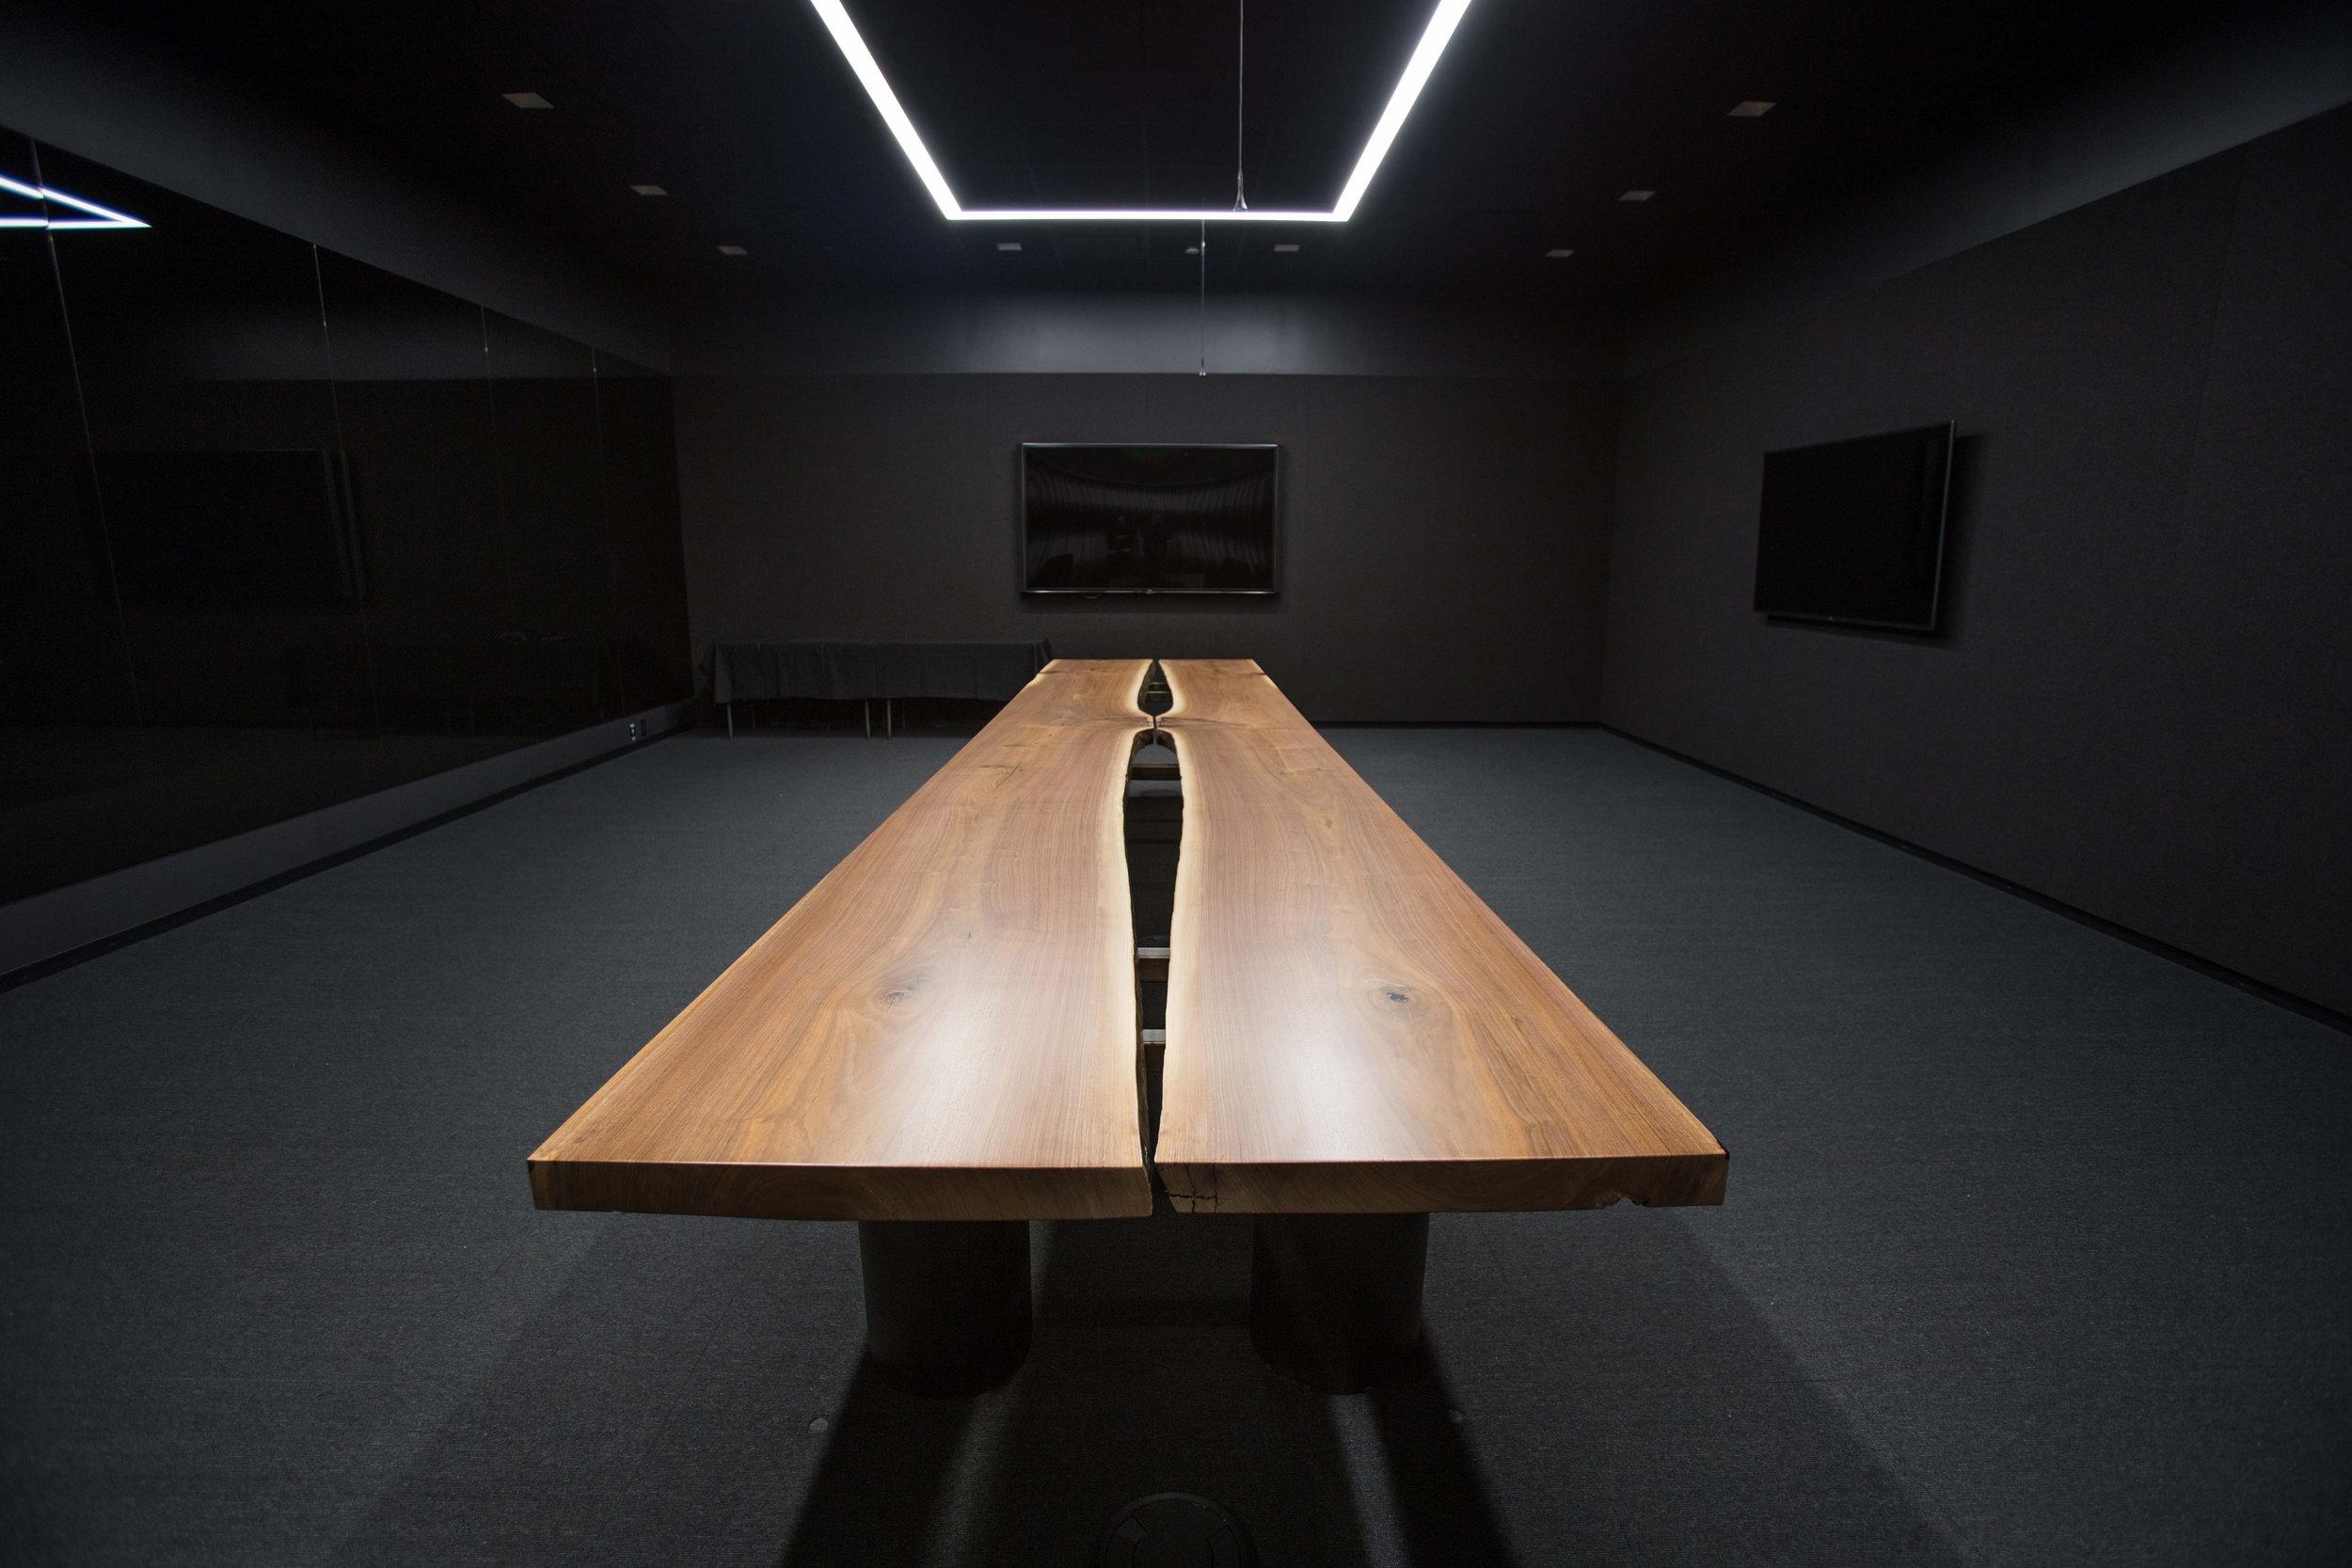 conferencetable2.jpg